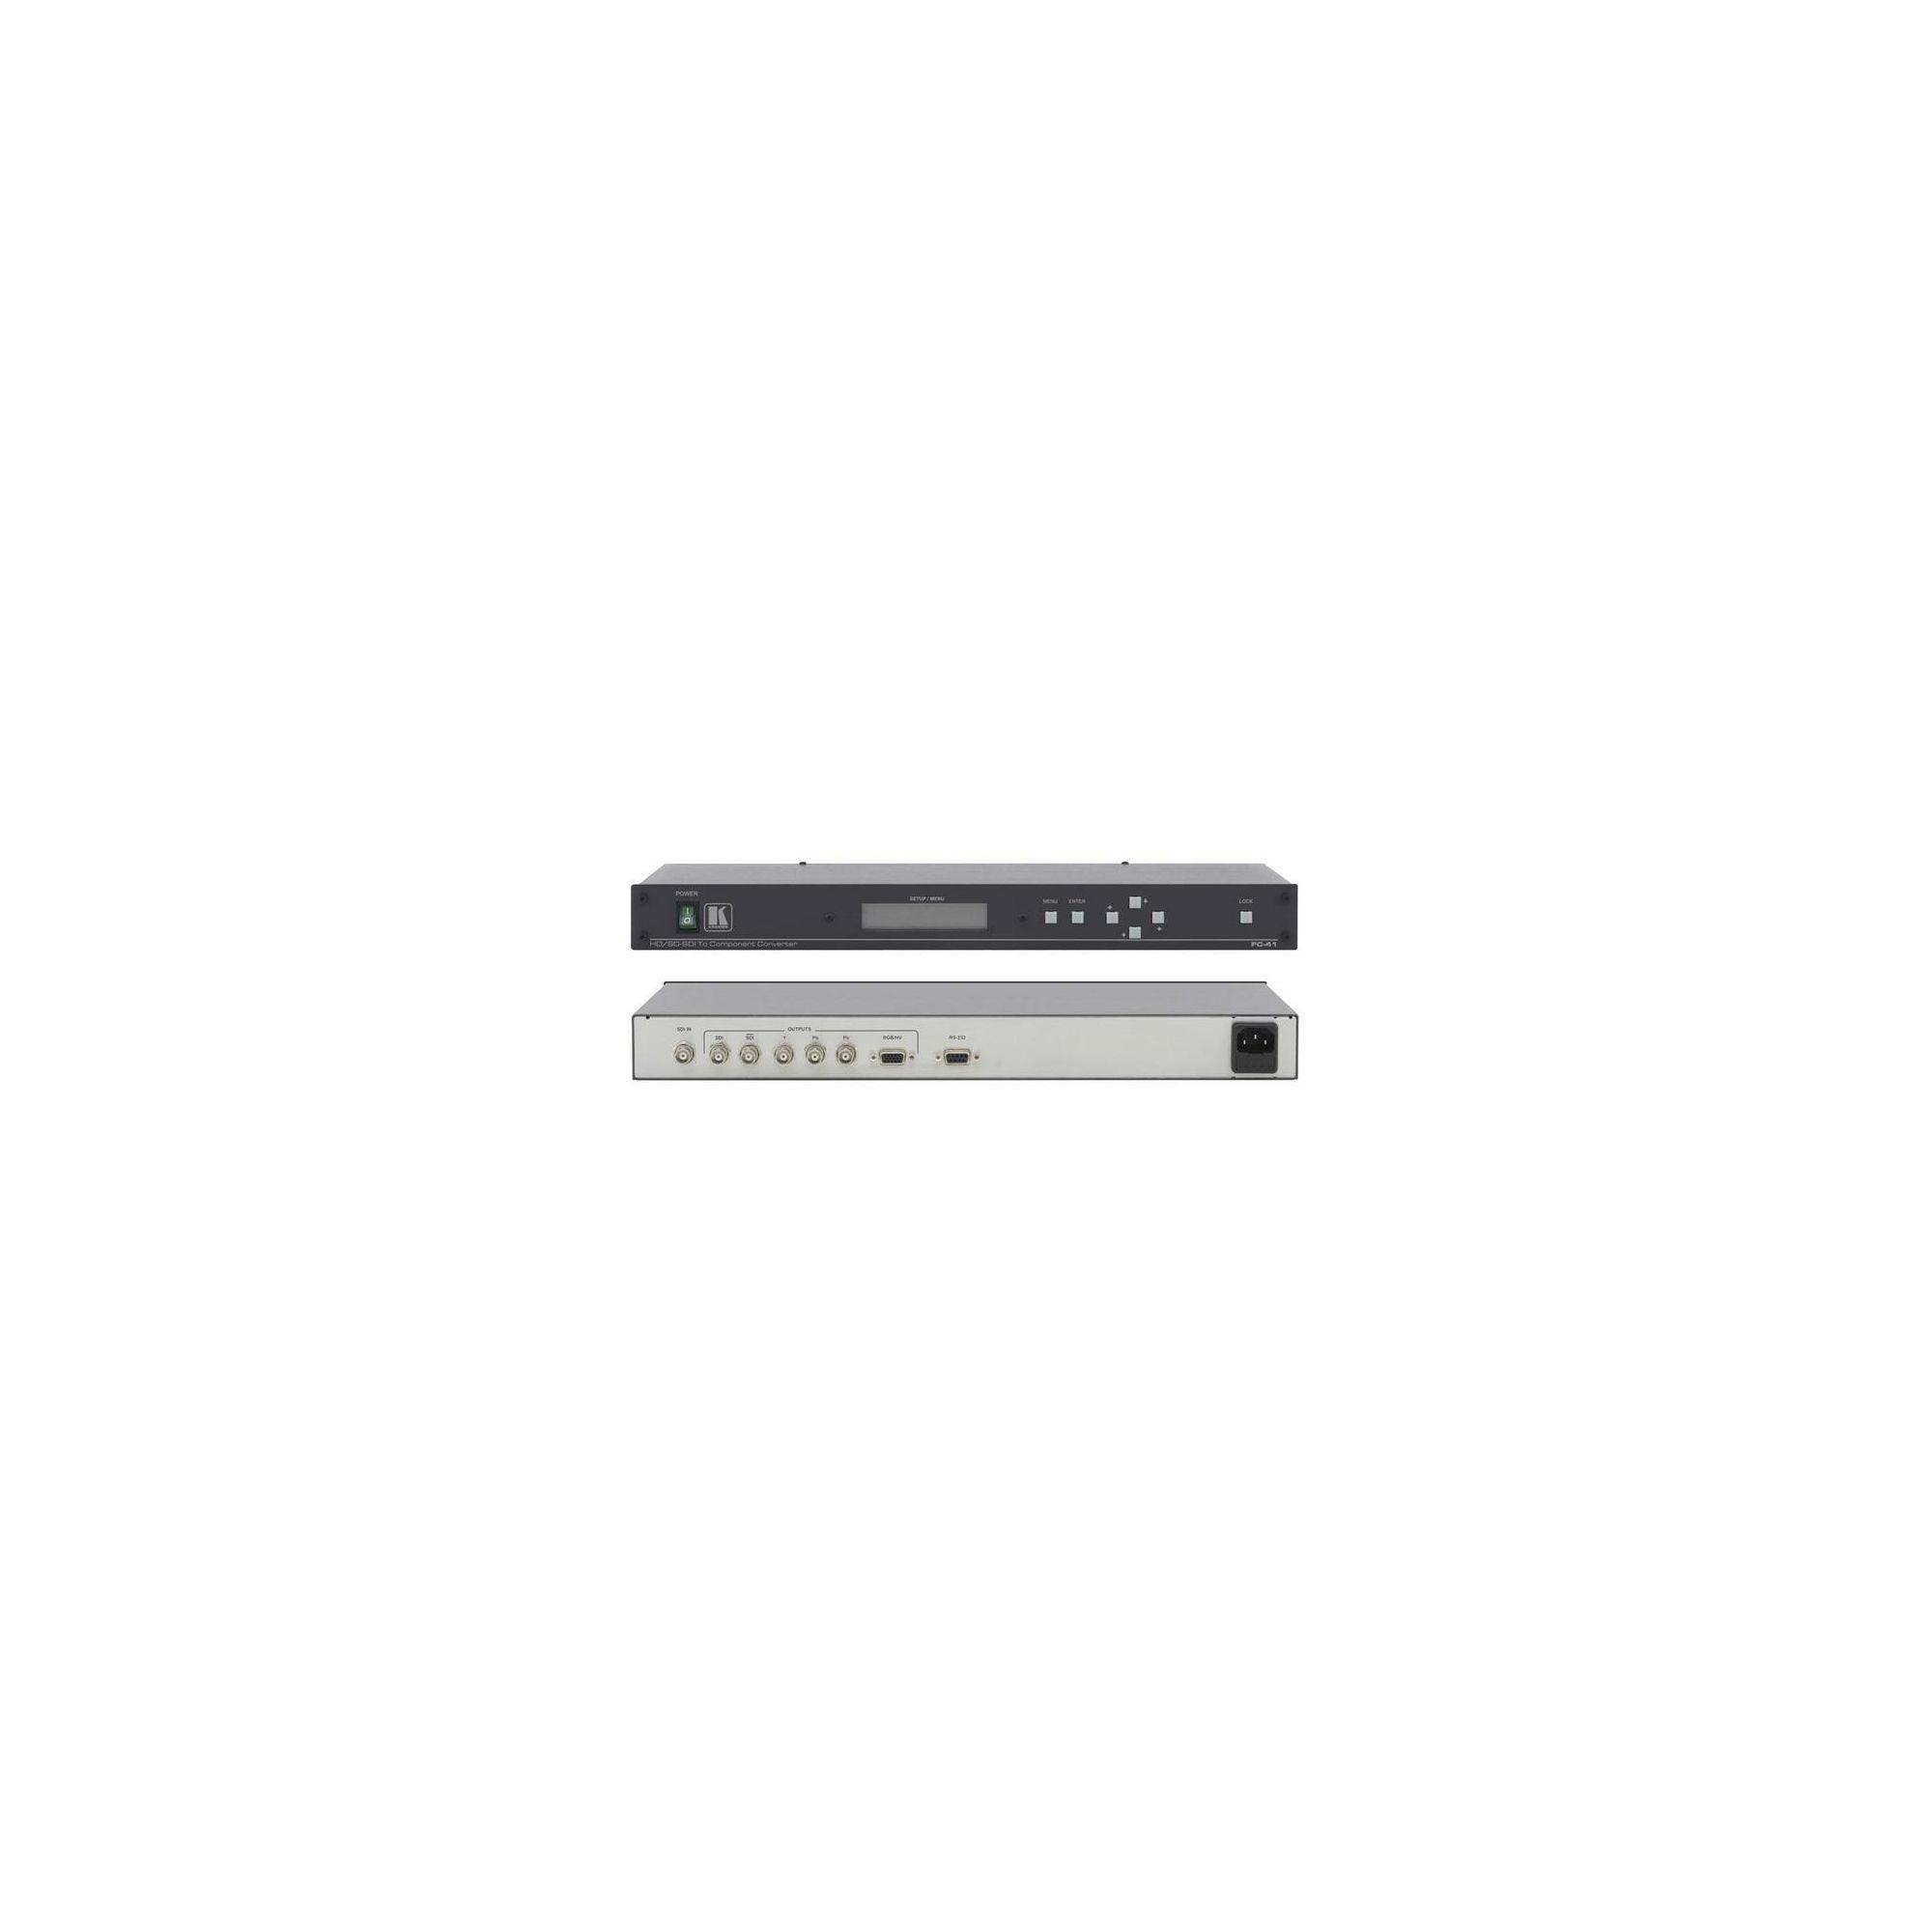 HD-SDI TO COMPONENT HD CONVERTOR at Tesco Direct